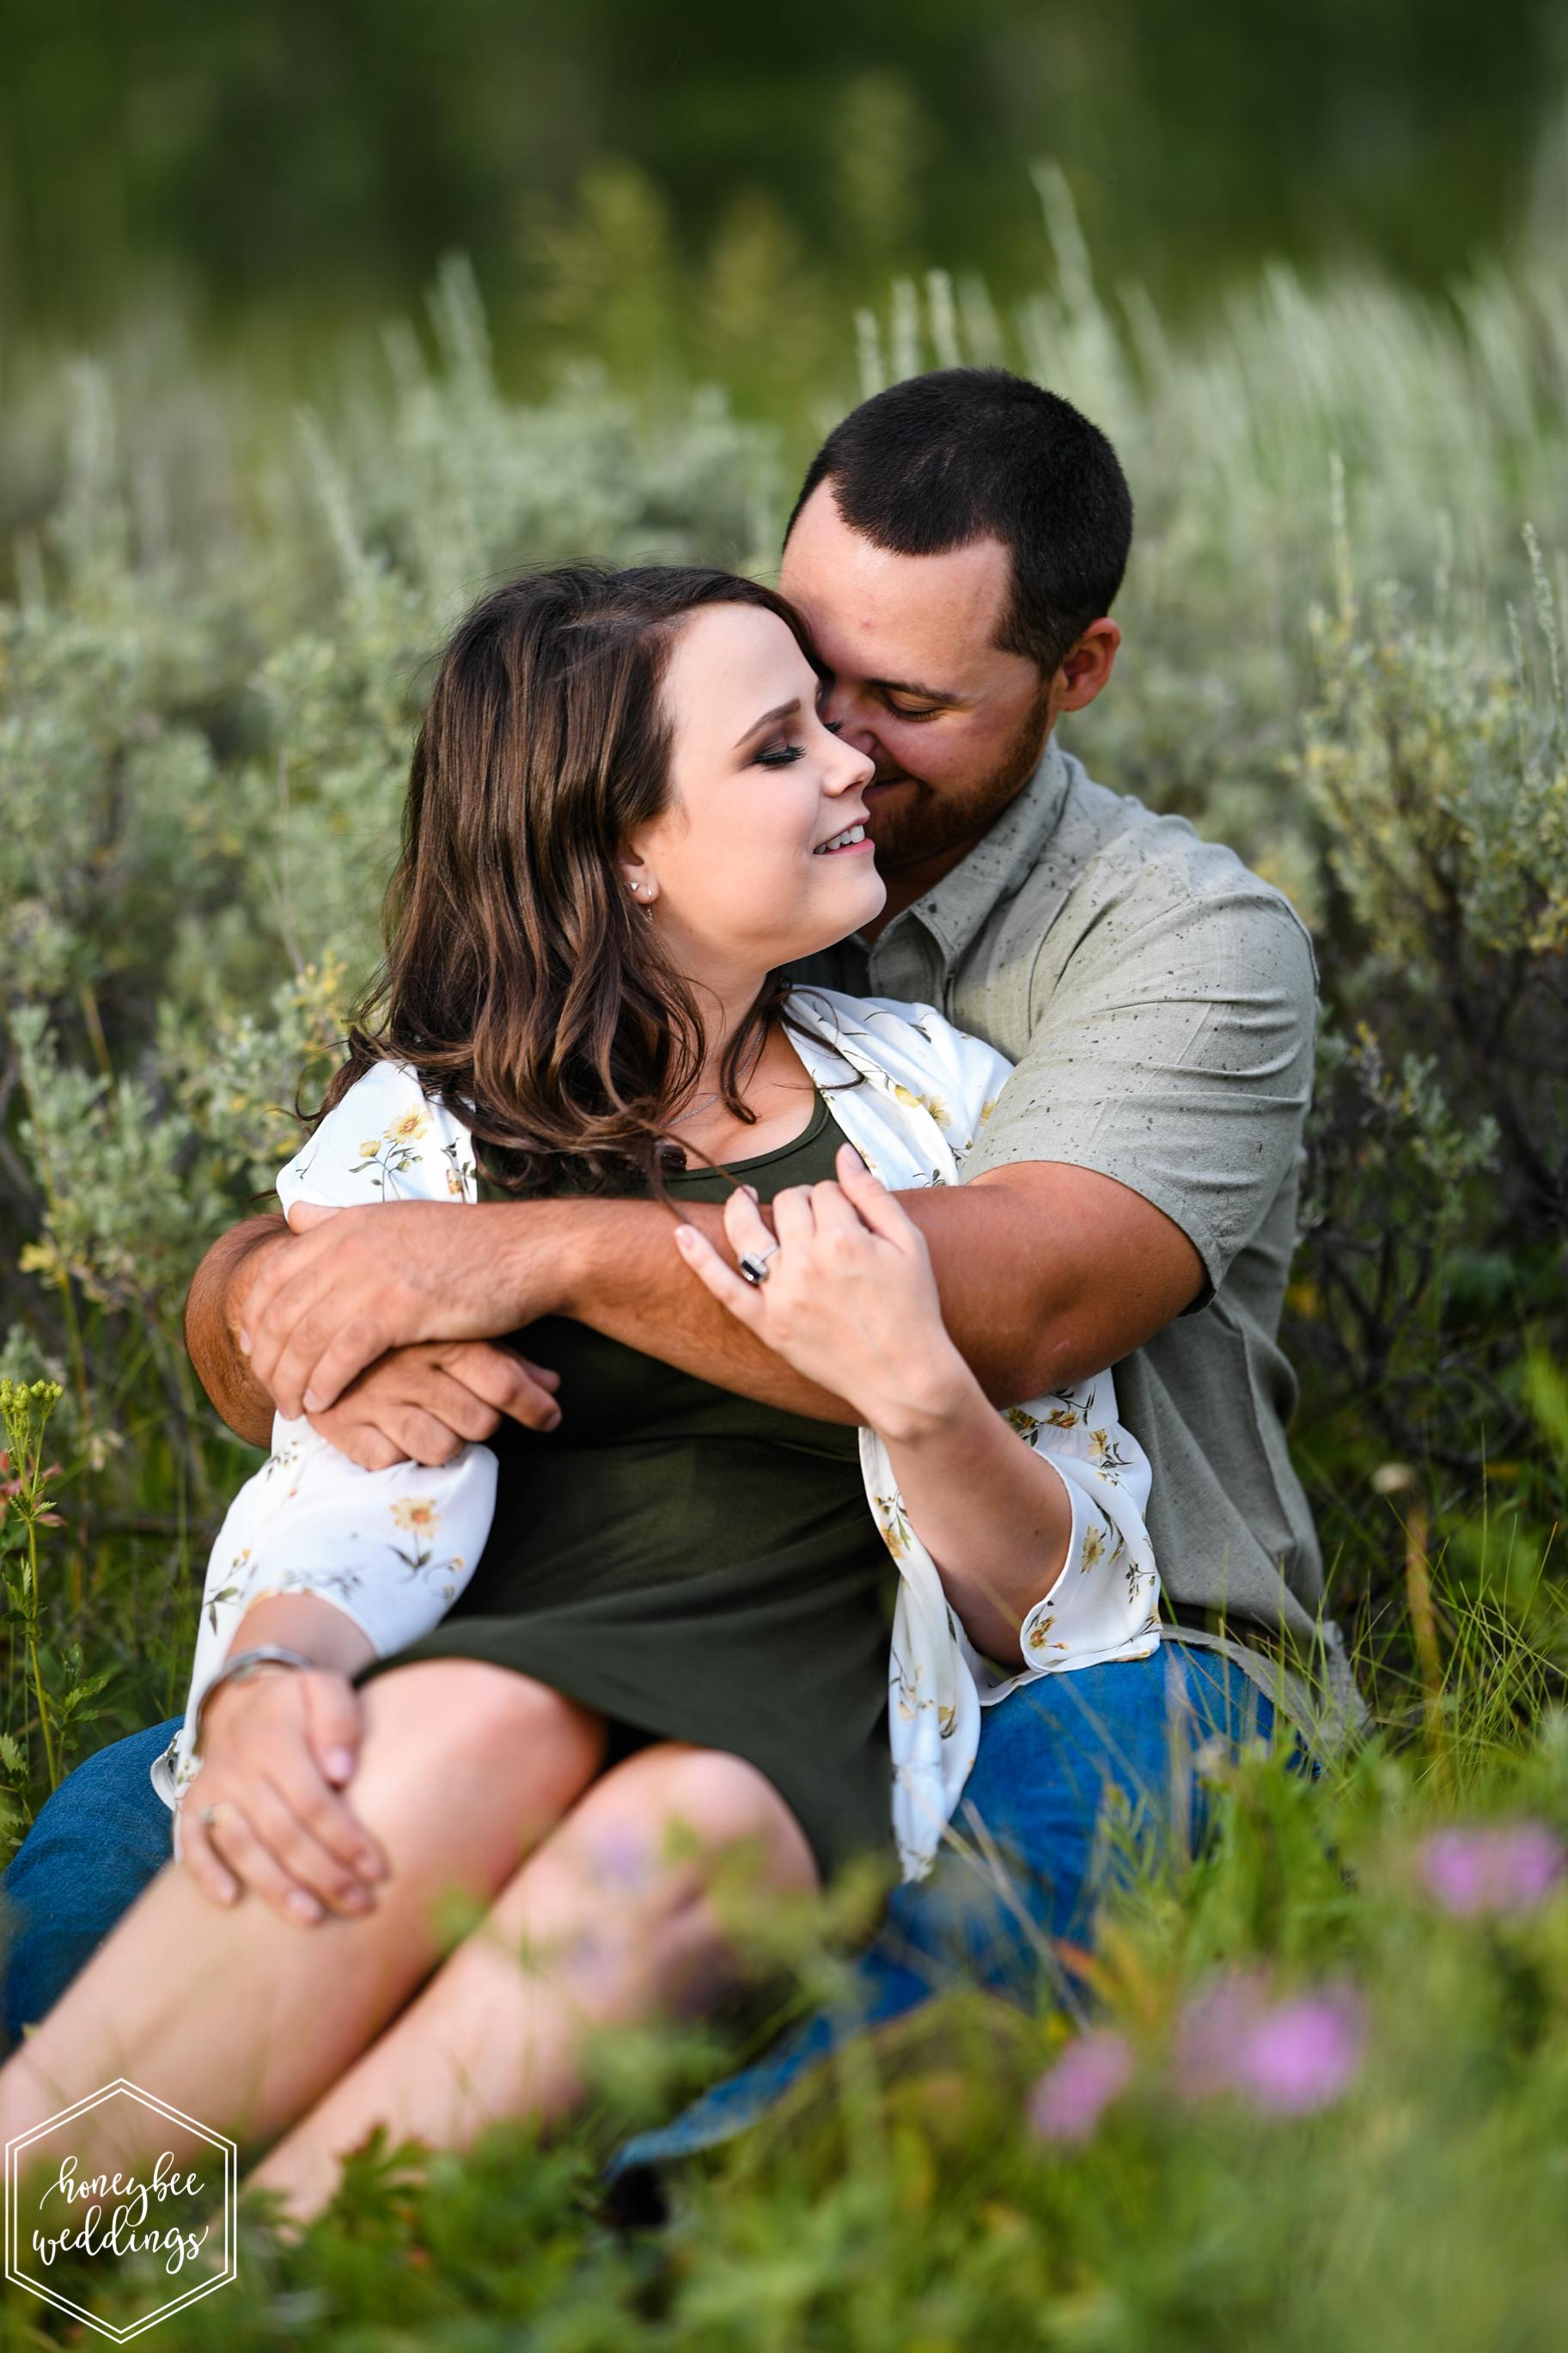 022Yellowstone National Park Wedding Photographer_Montana Engagement Session_Kelsie & DJ_July 24, 2019-23.jpg